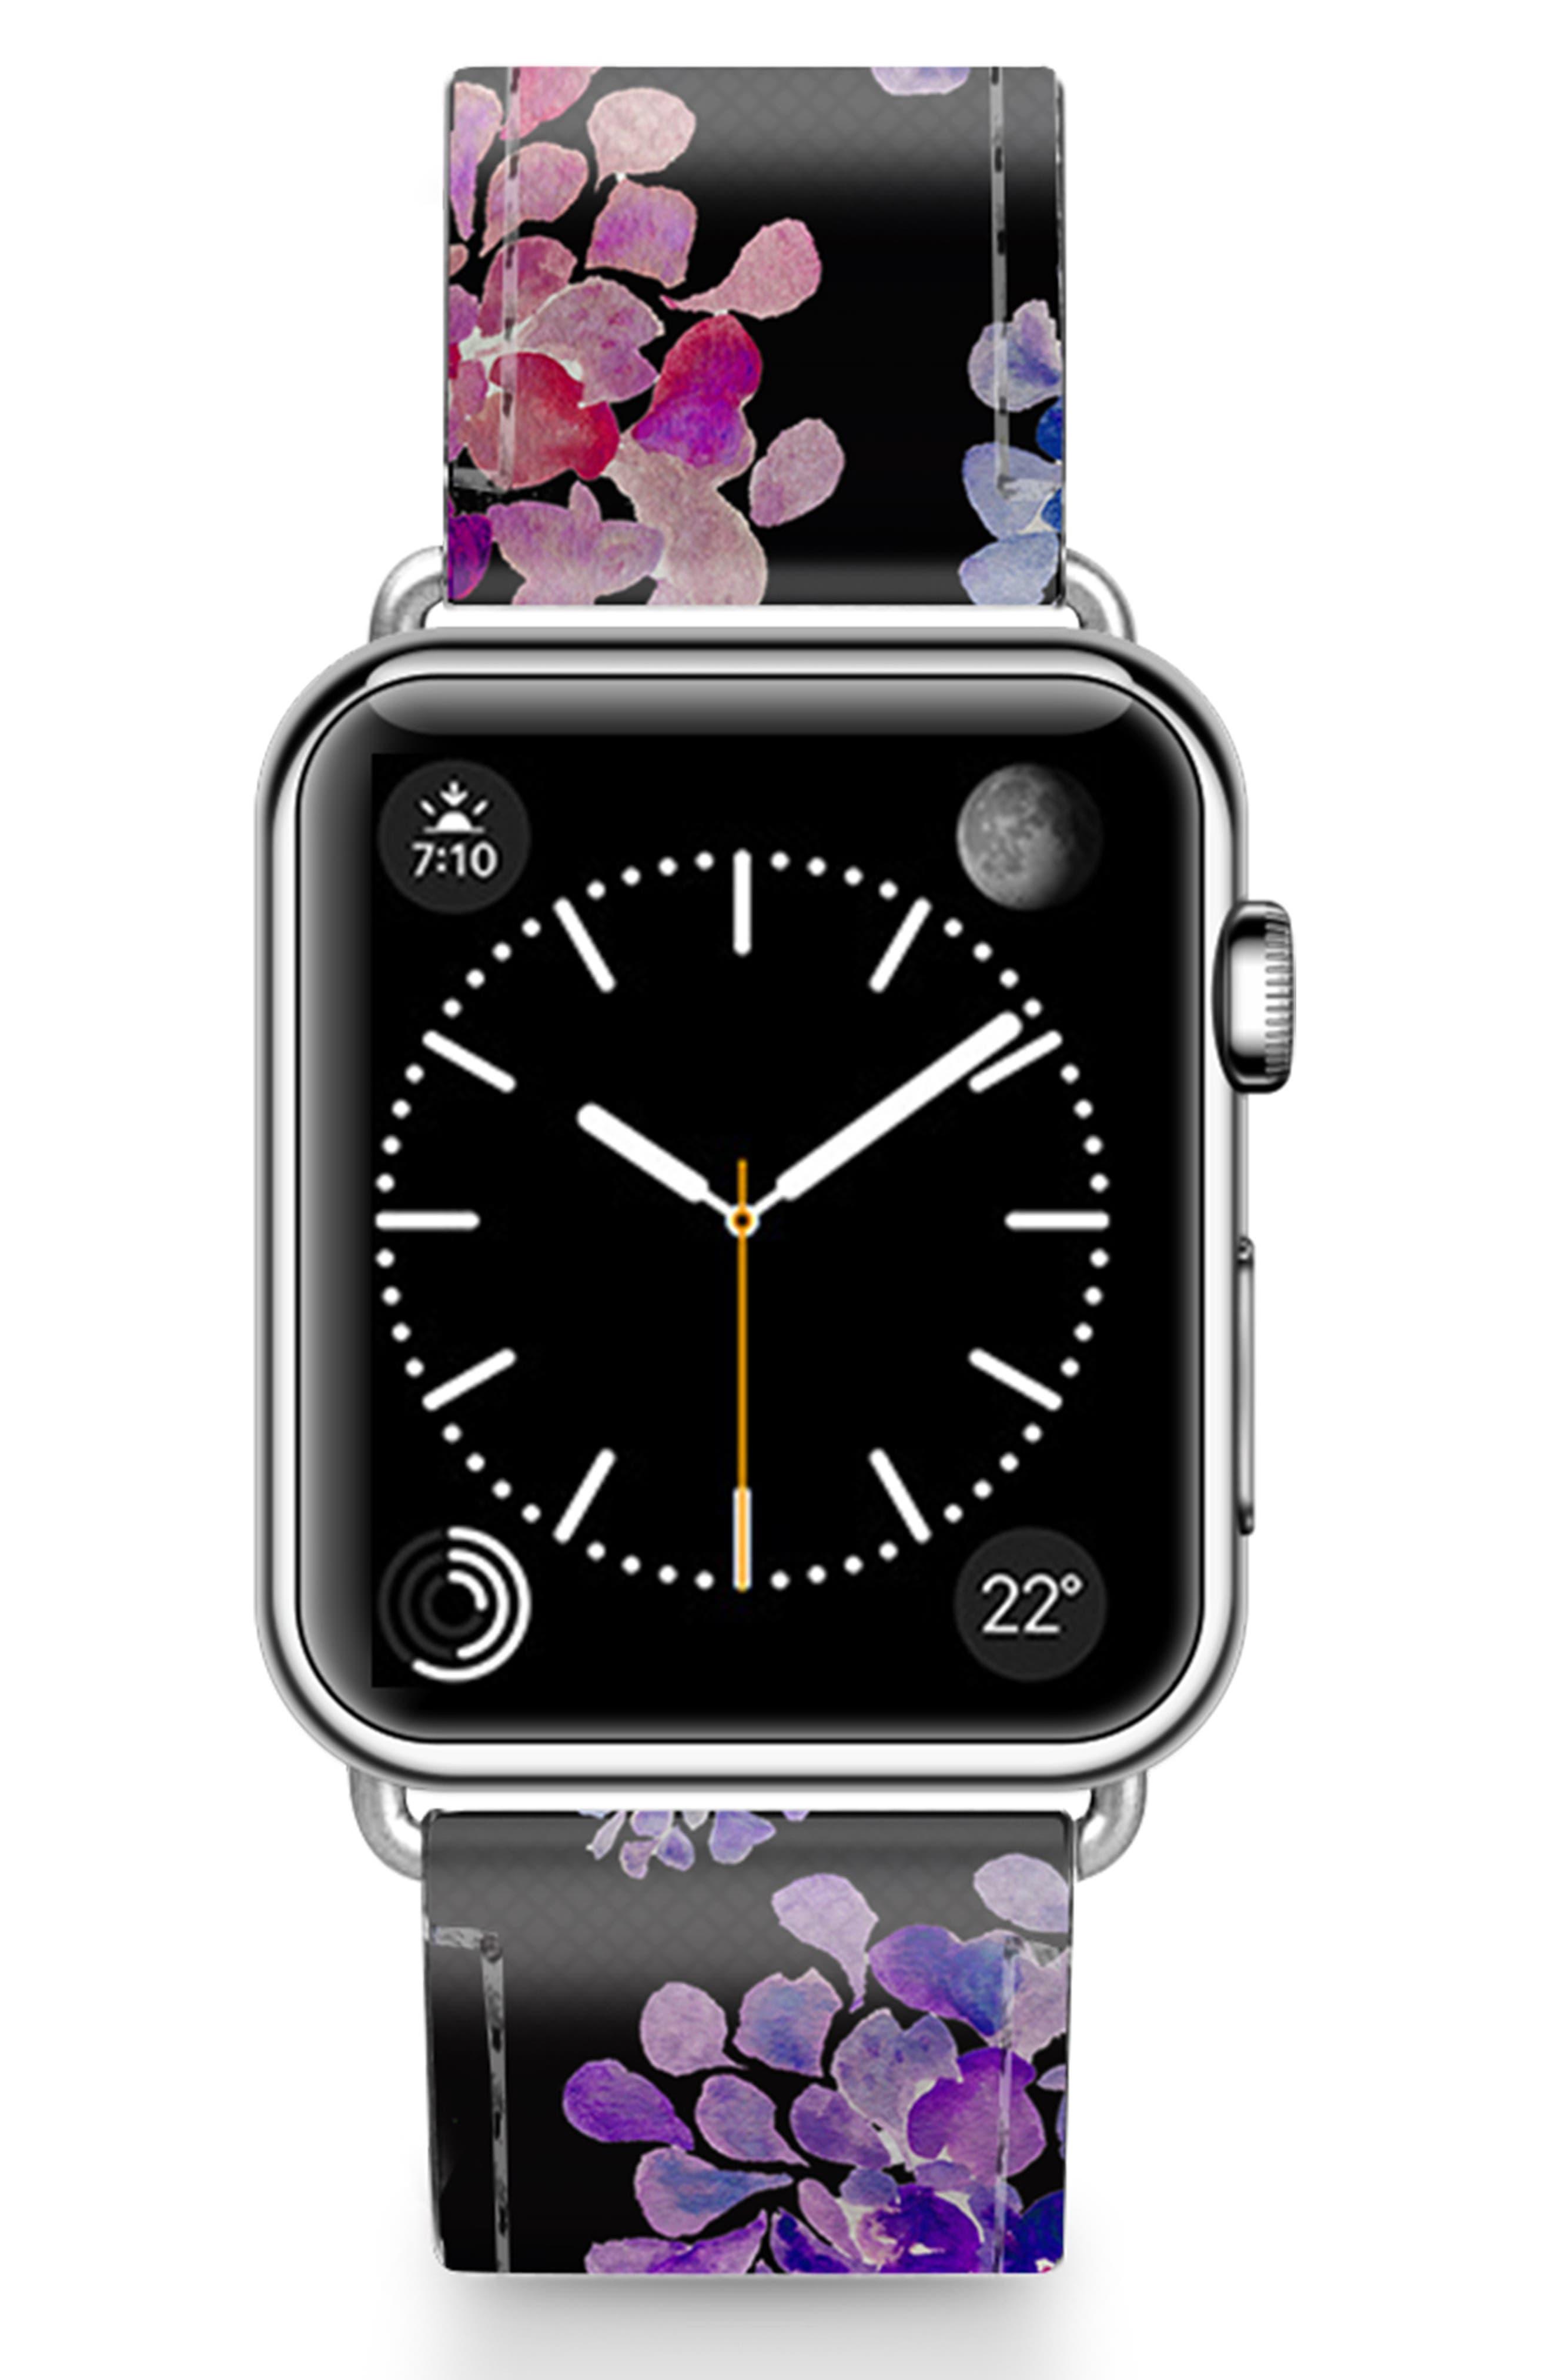 CASETIFY Saffiano Purple Flowers Faux Leather Apple Watch Strap, Main, color, BLACK/ SILVER